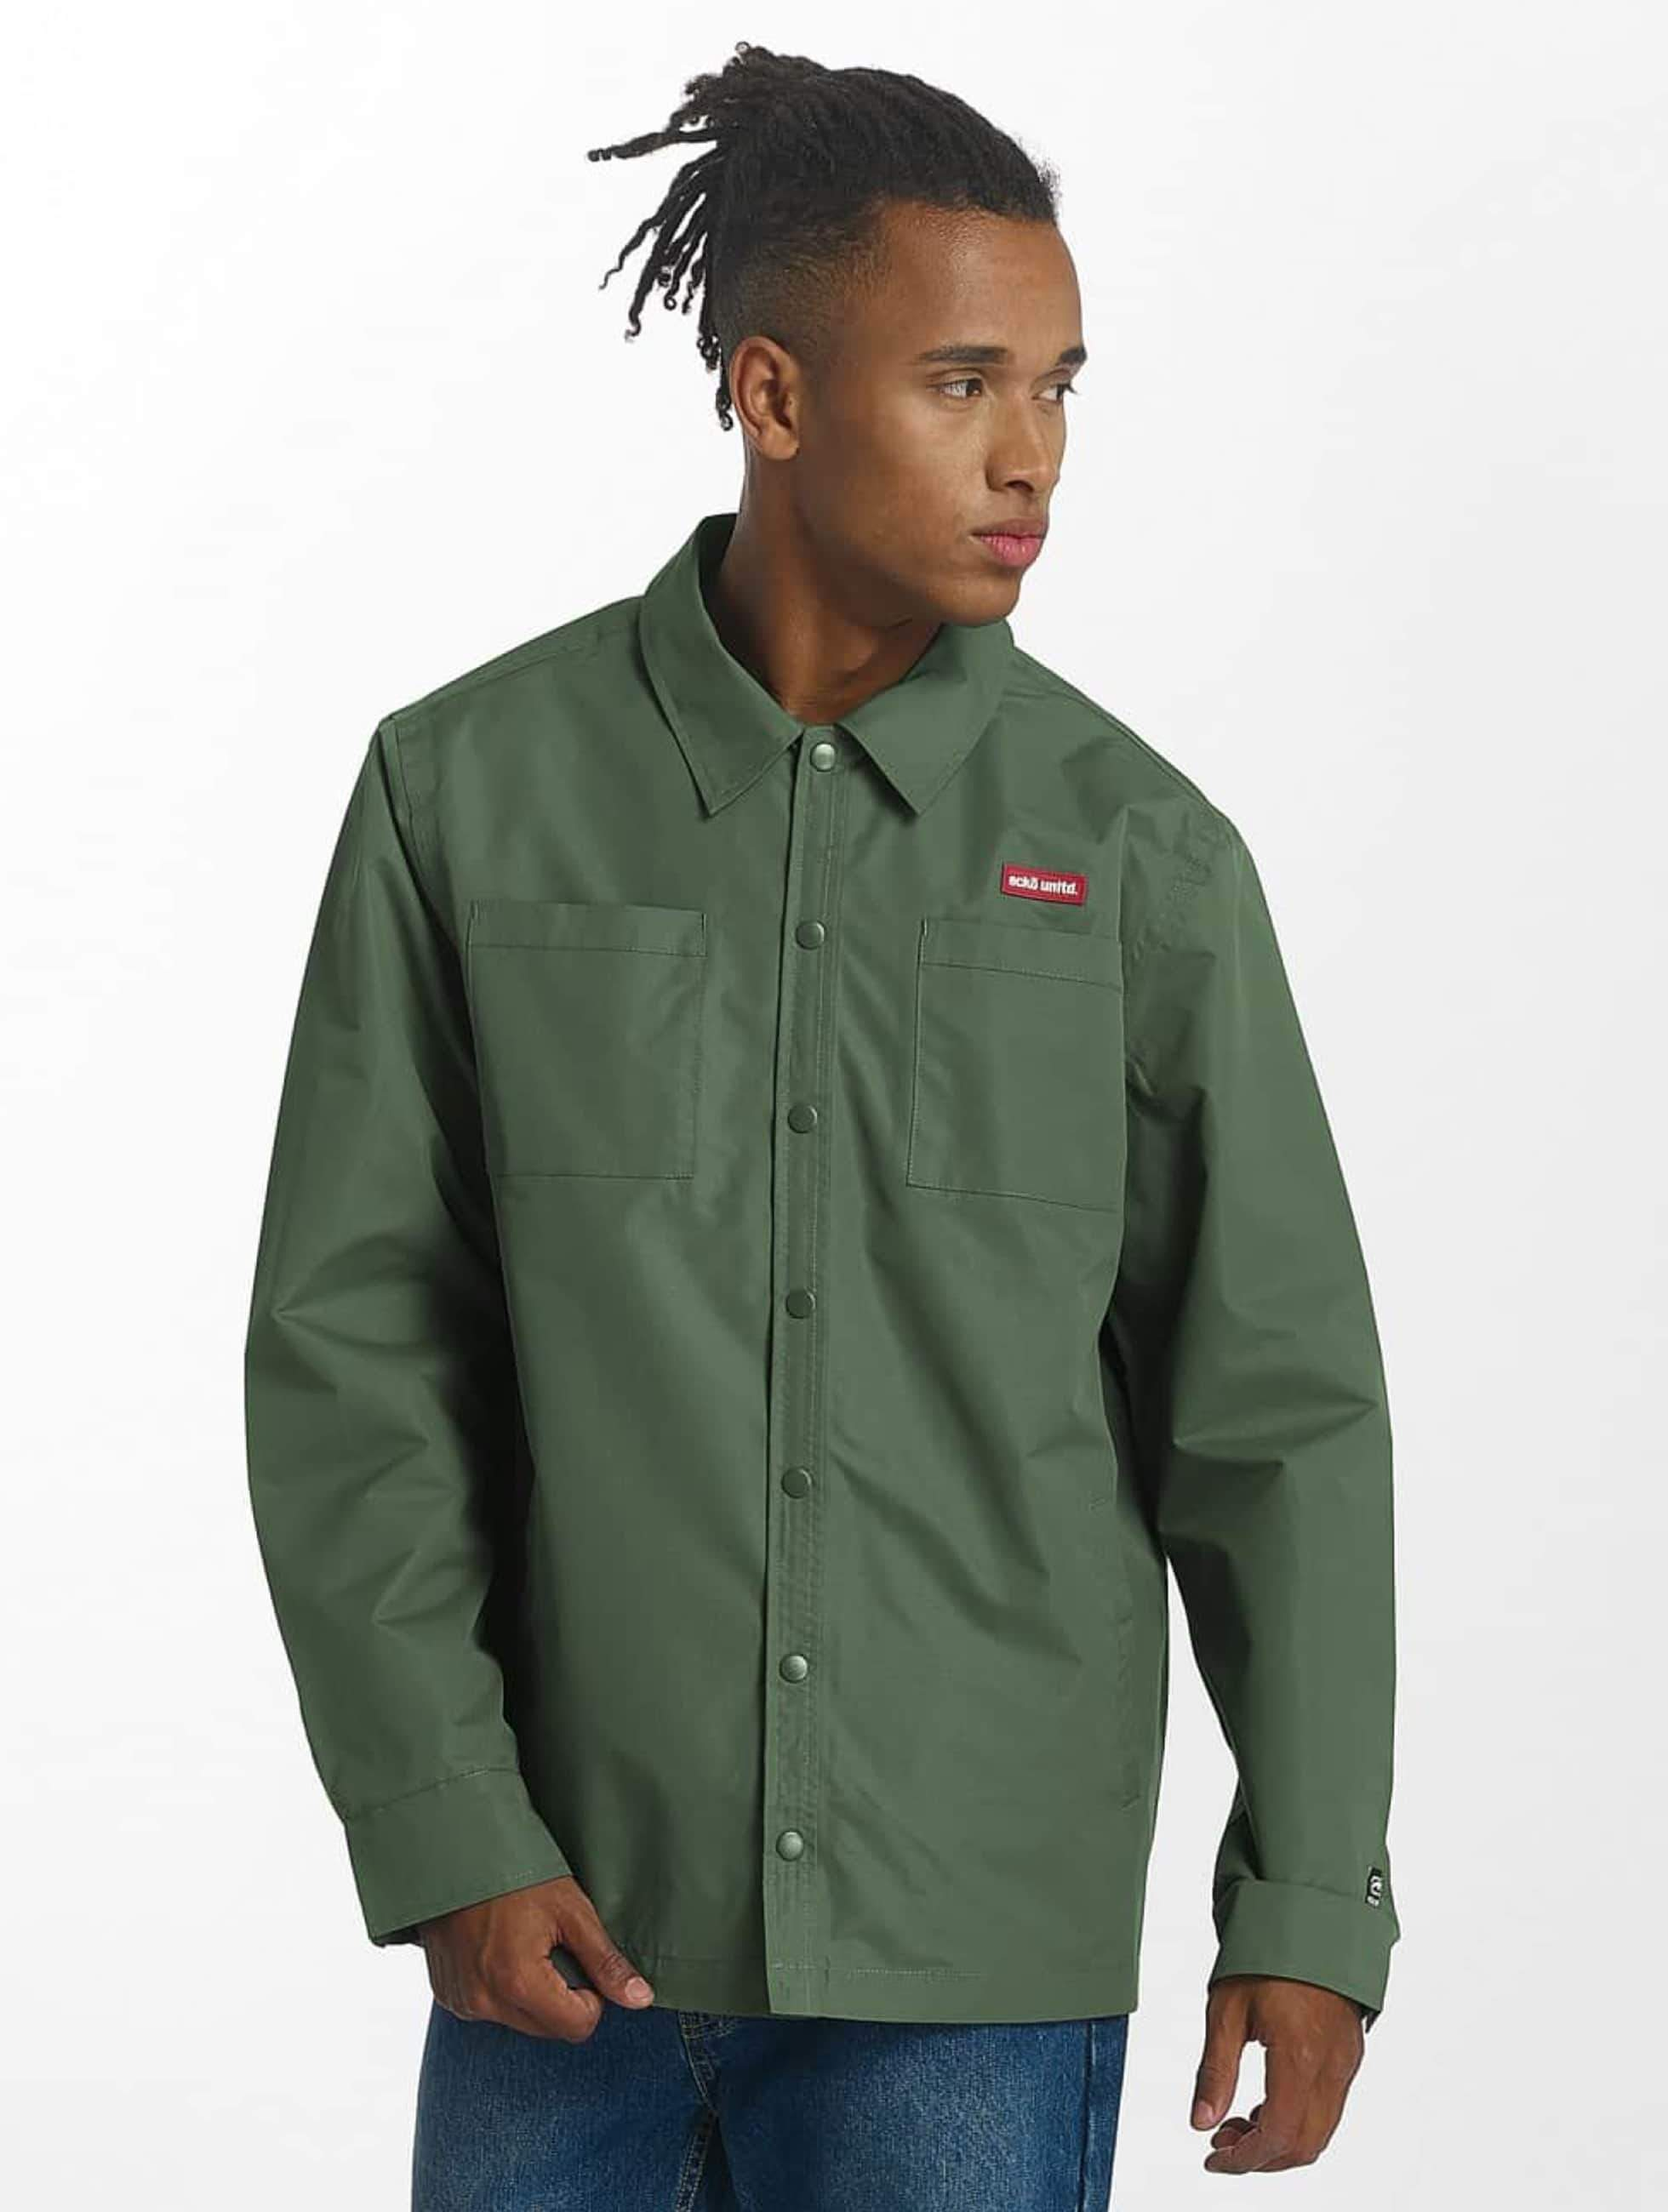 Ecko Unltd. / Lightweight Jacket BananaBeach in olive S